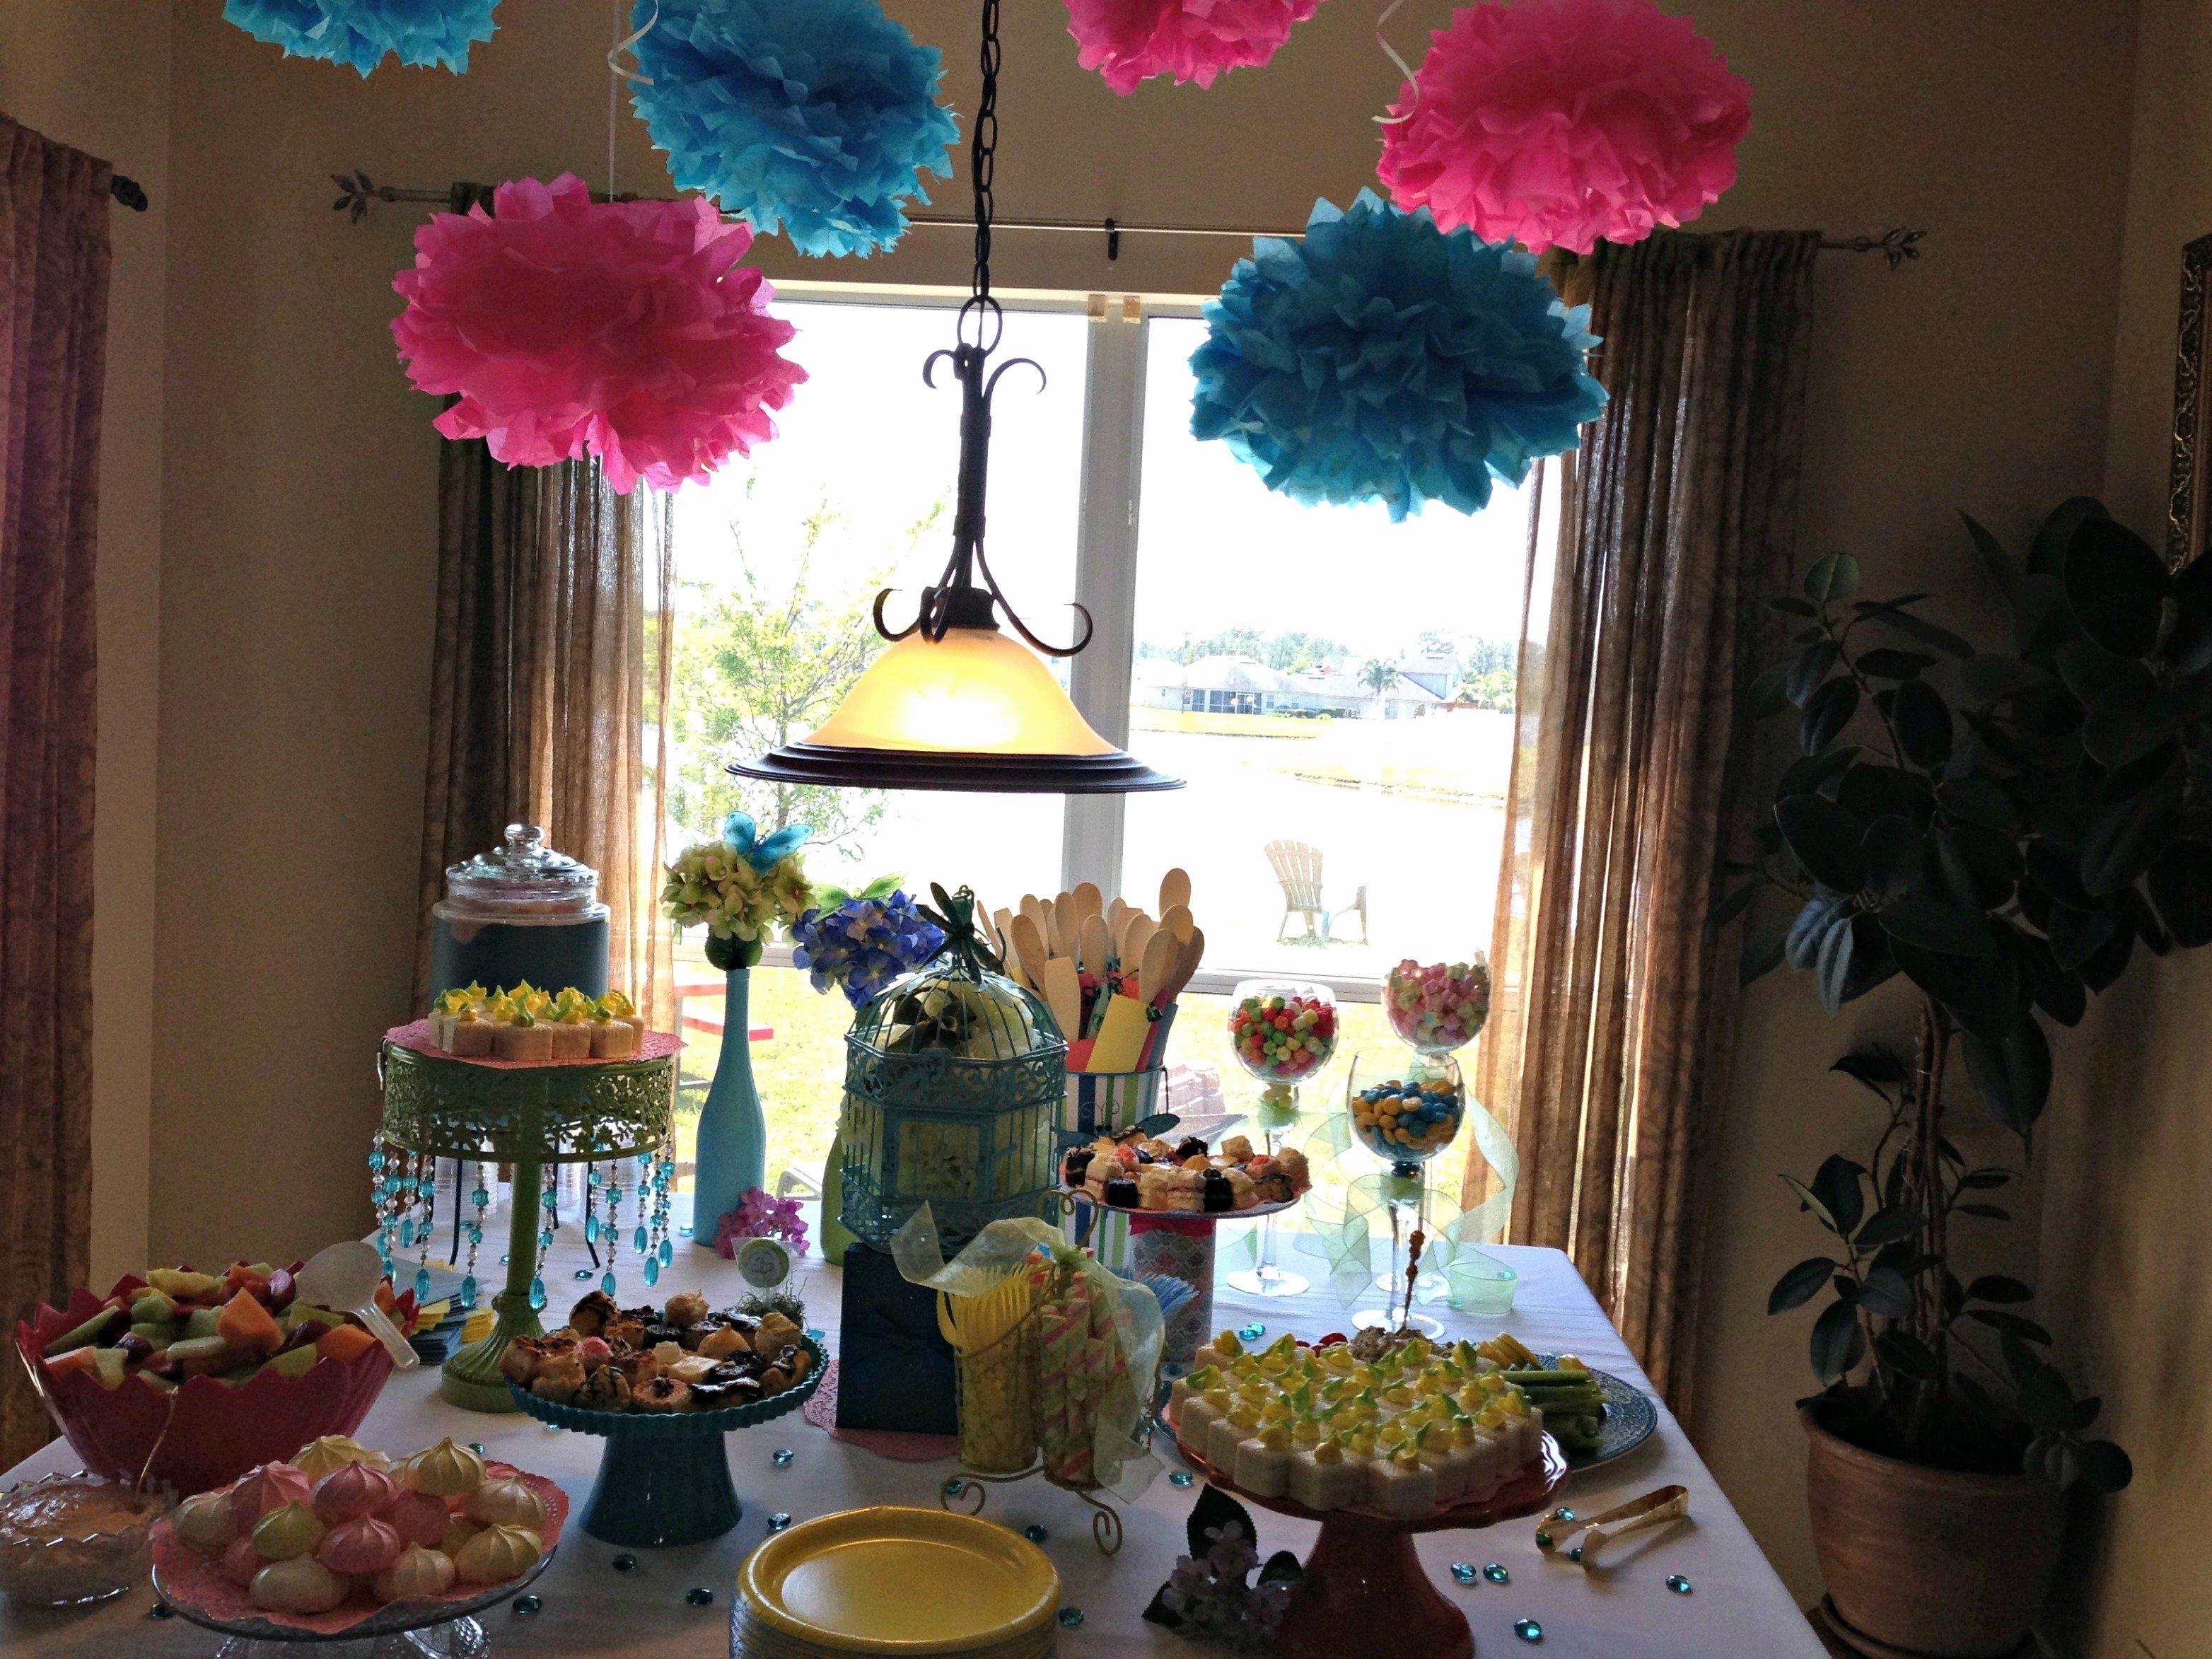 10 Lovable Bridal Shower Ideas On Pinterest wedding shower decoration ideas luxury easy diy bridal shower ideas 2020